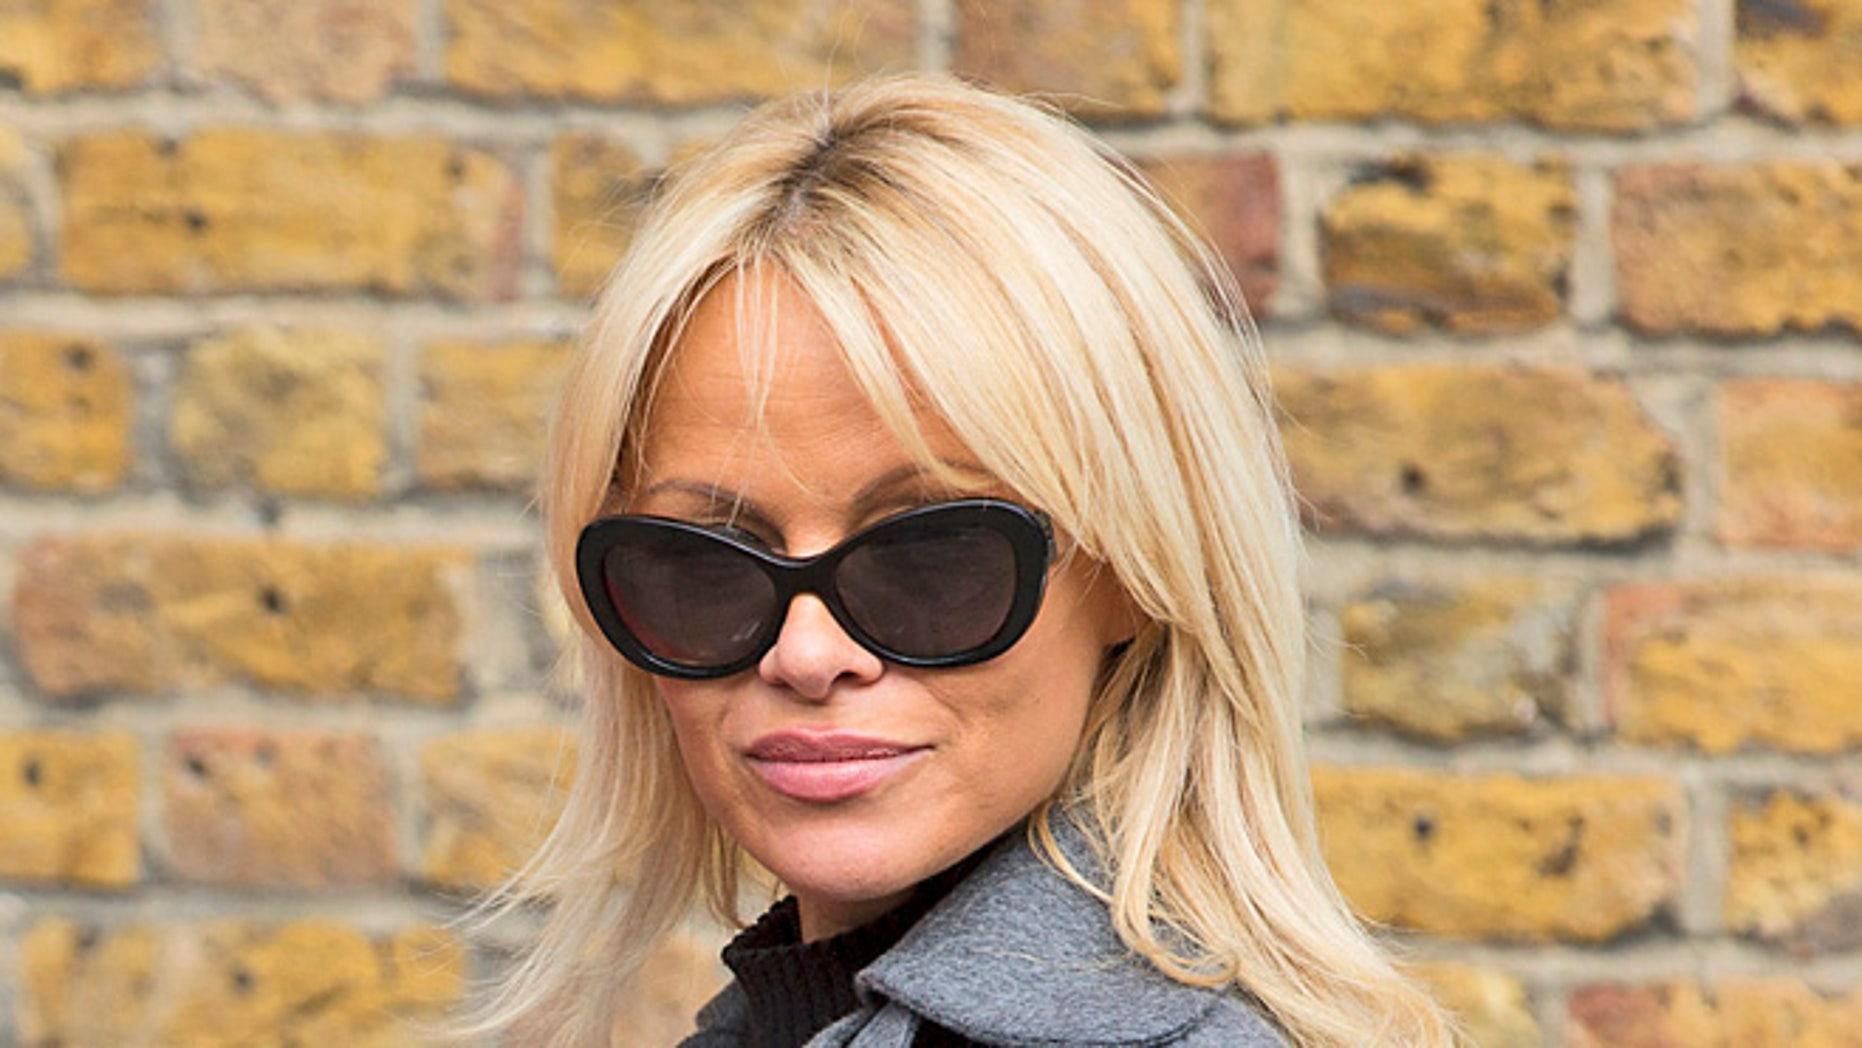 Pamela Anderson dropped off a vegan meal for WikiLeaks chief Julian Assange.